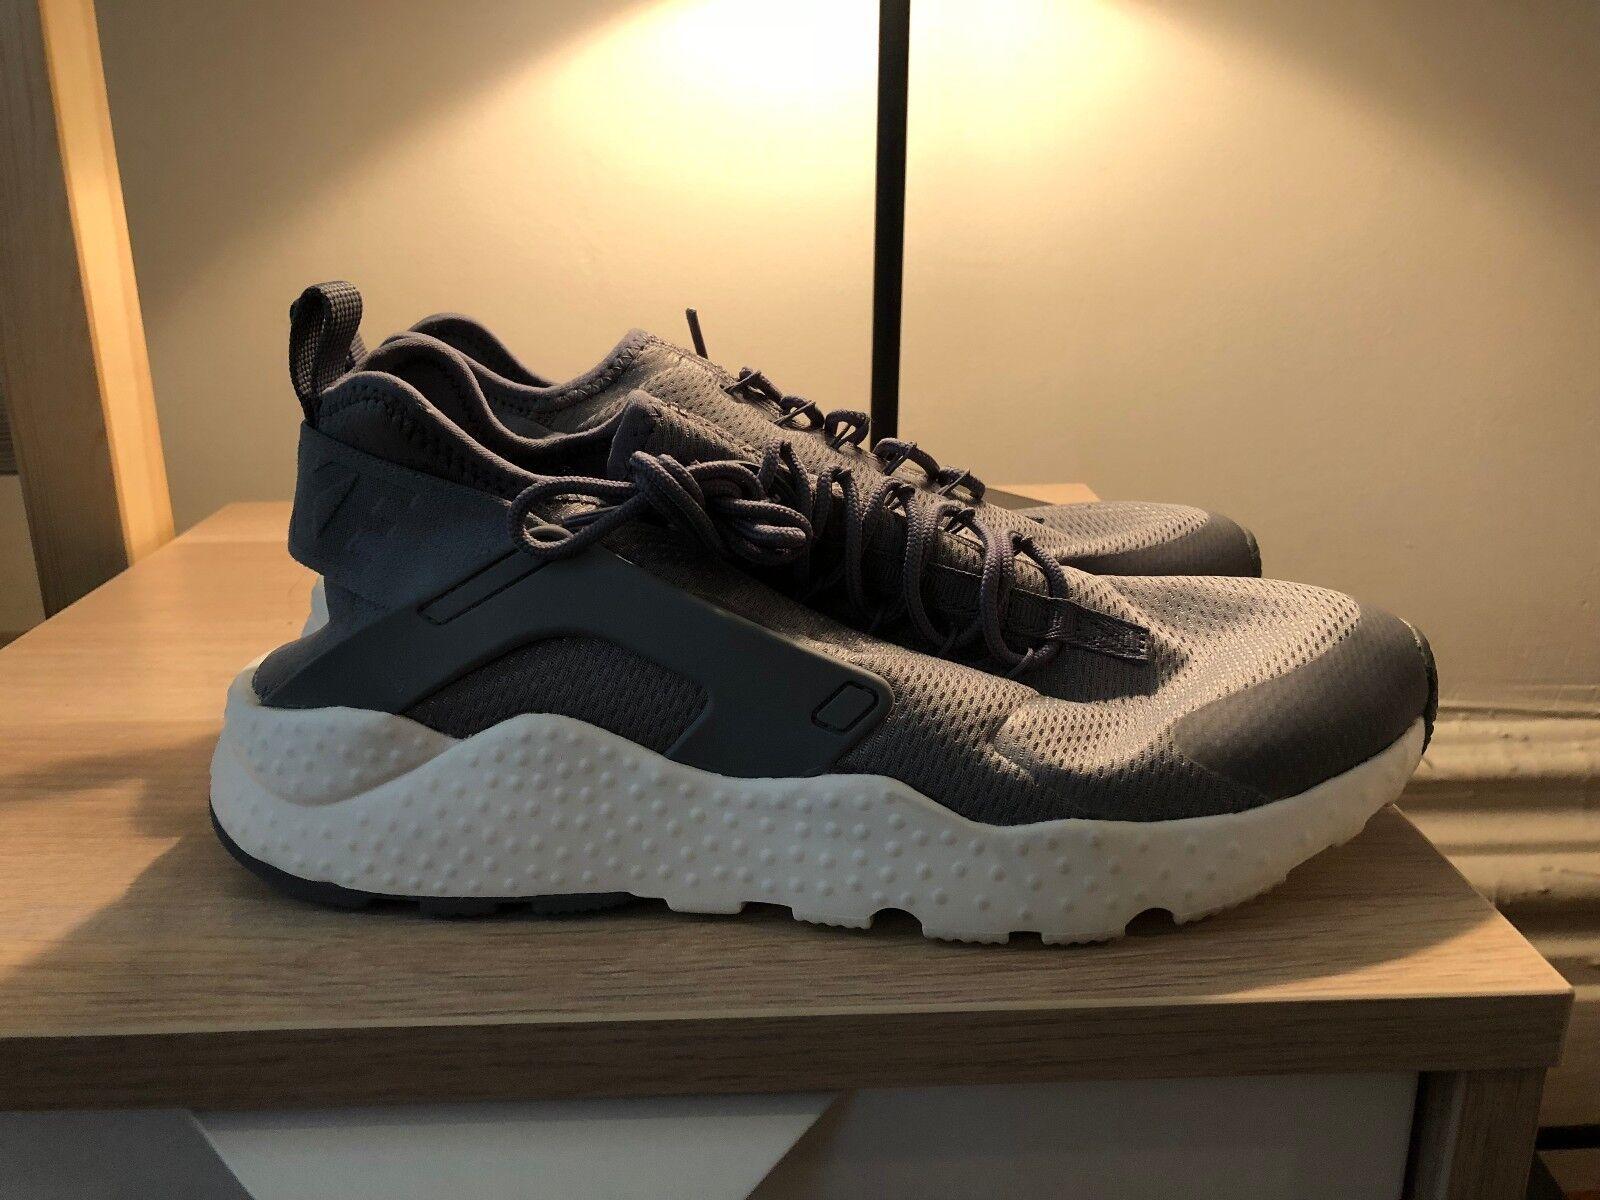 Nike Air Huarache Run Ultra Running Shoes Cool Grey/Summit White 9.5